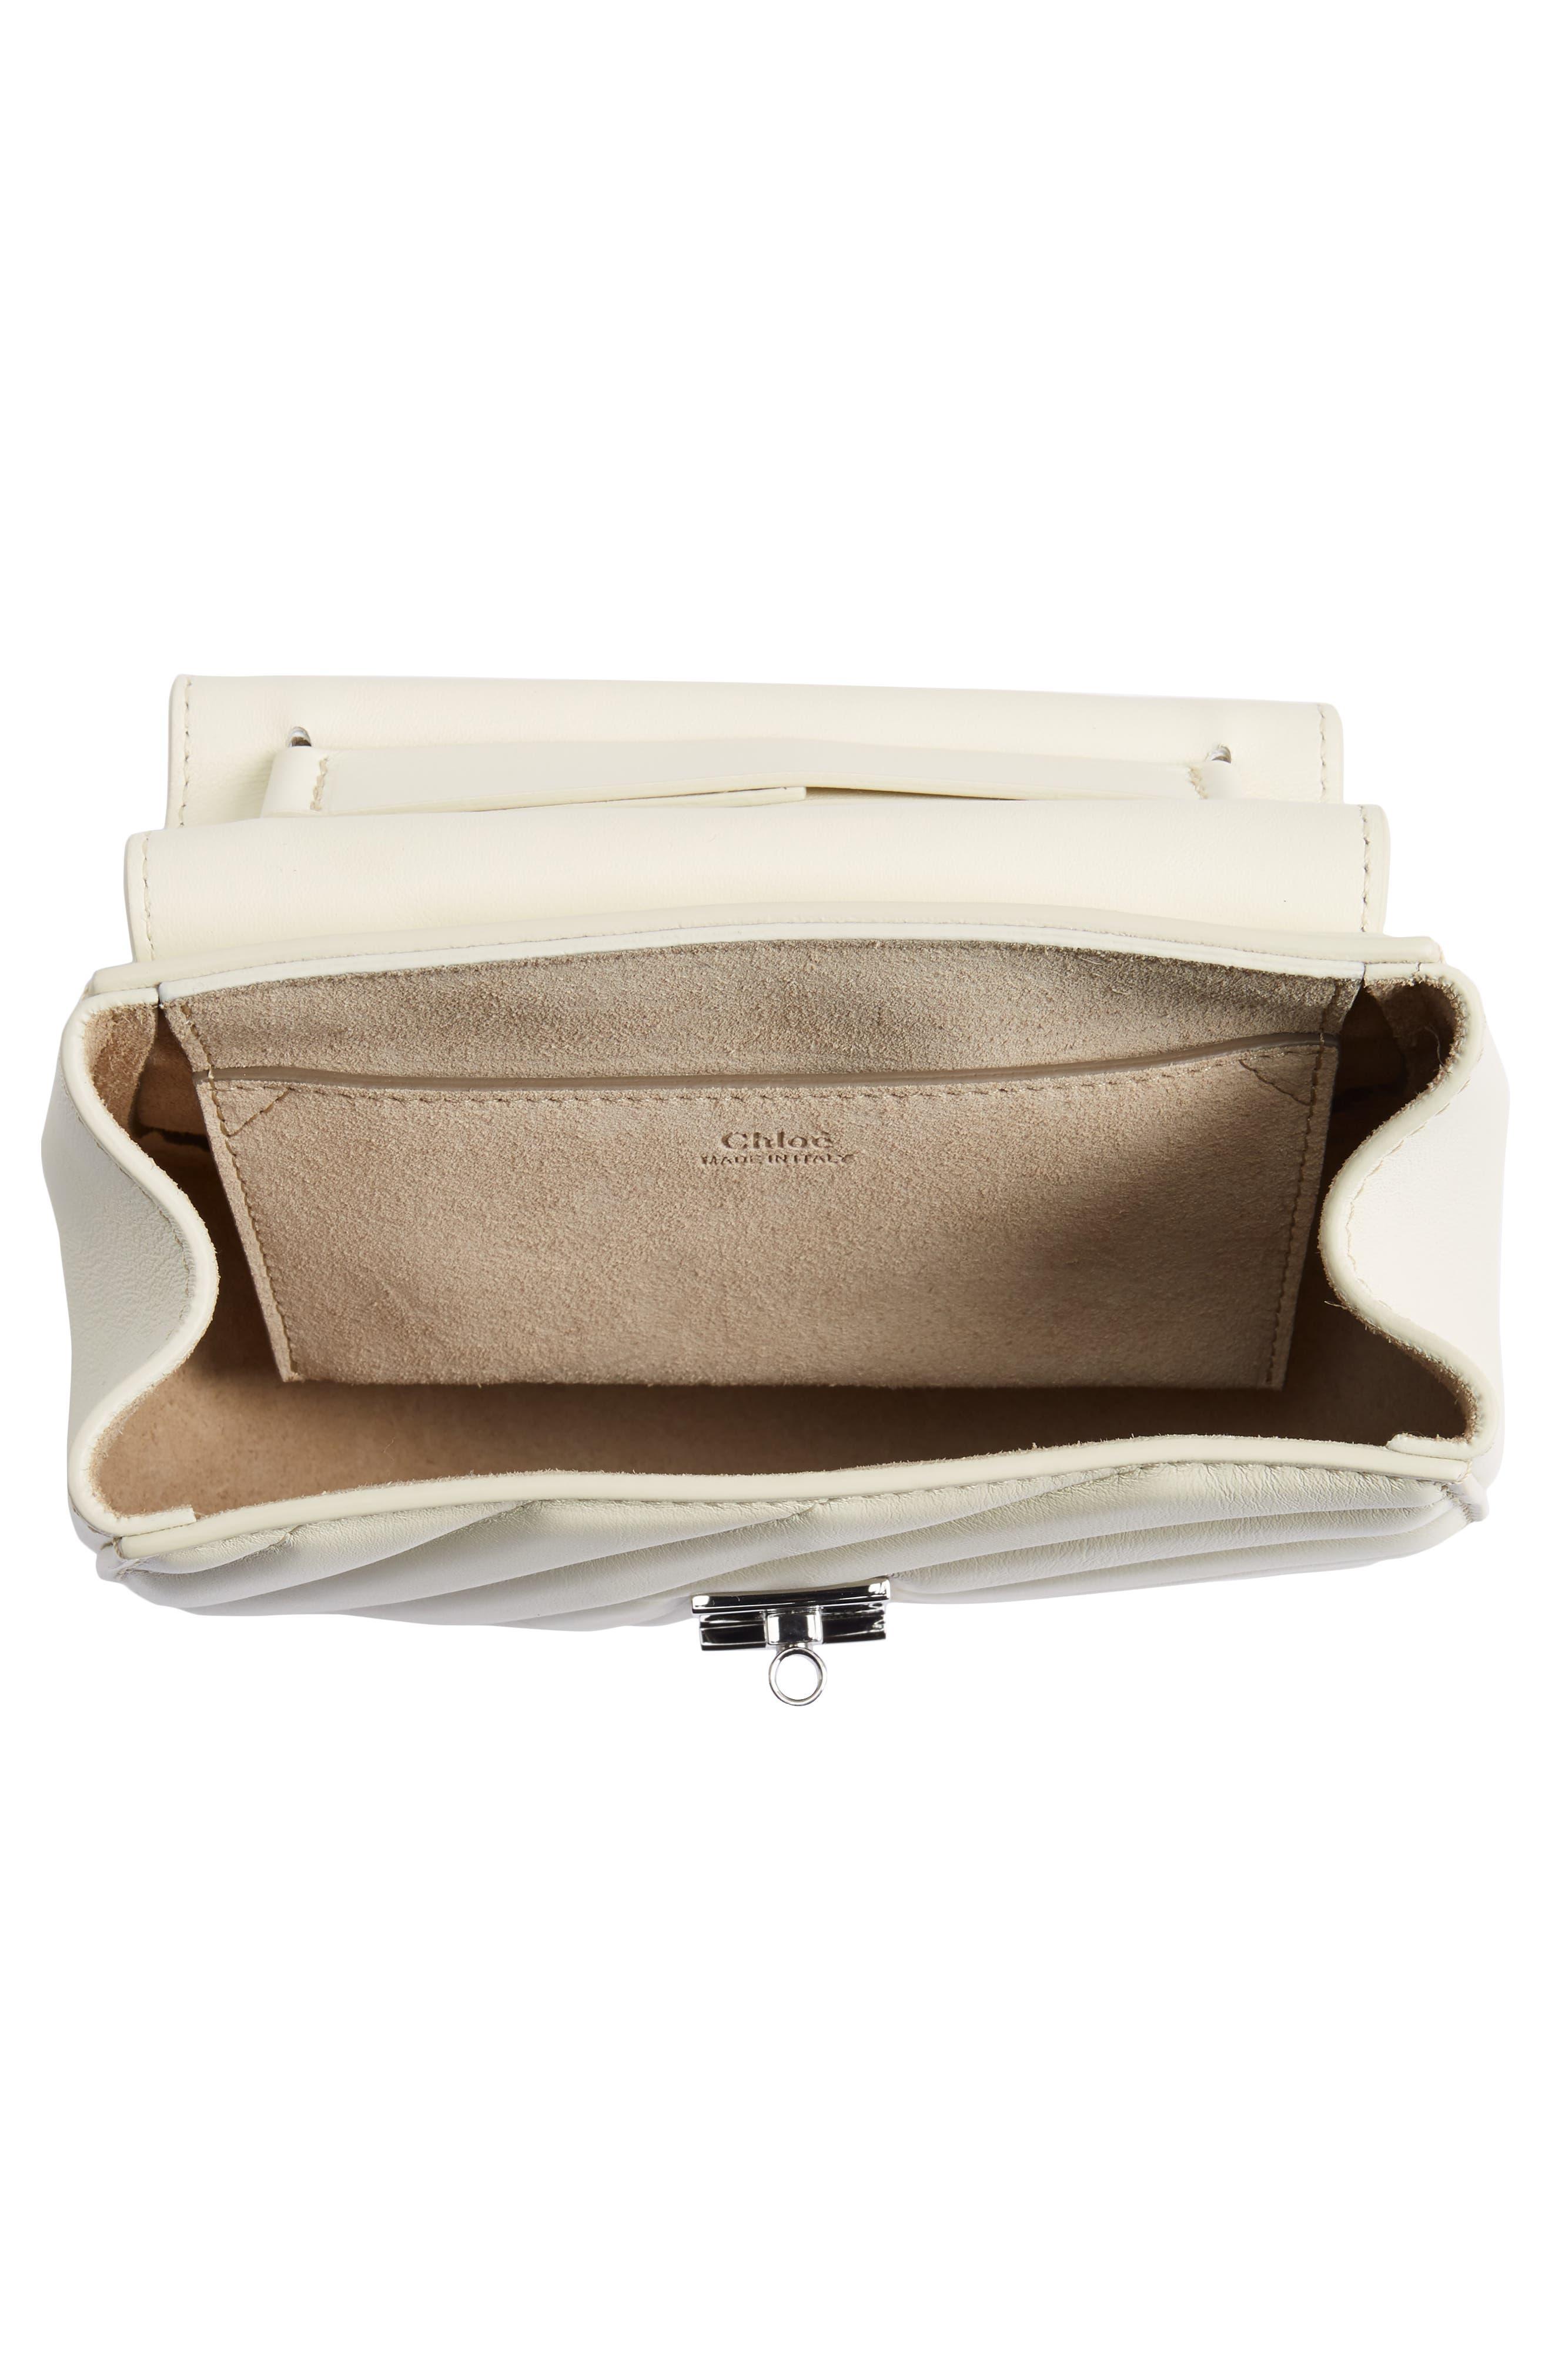 Mini Drew Bijoux Leather Shoulder Bag,                             Alternate thumbnail 8, color,                             Natural White